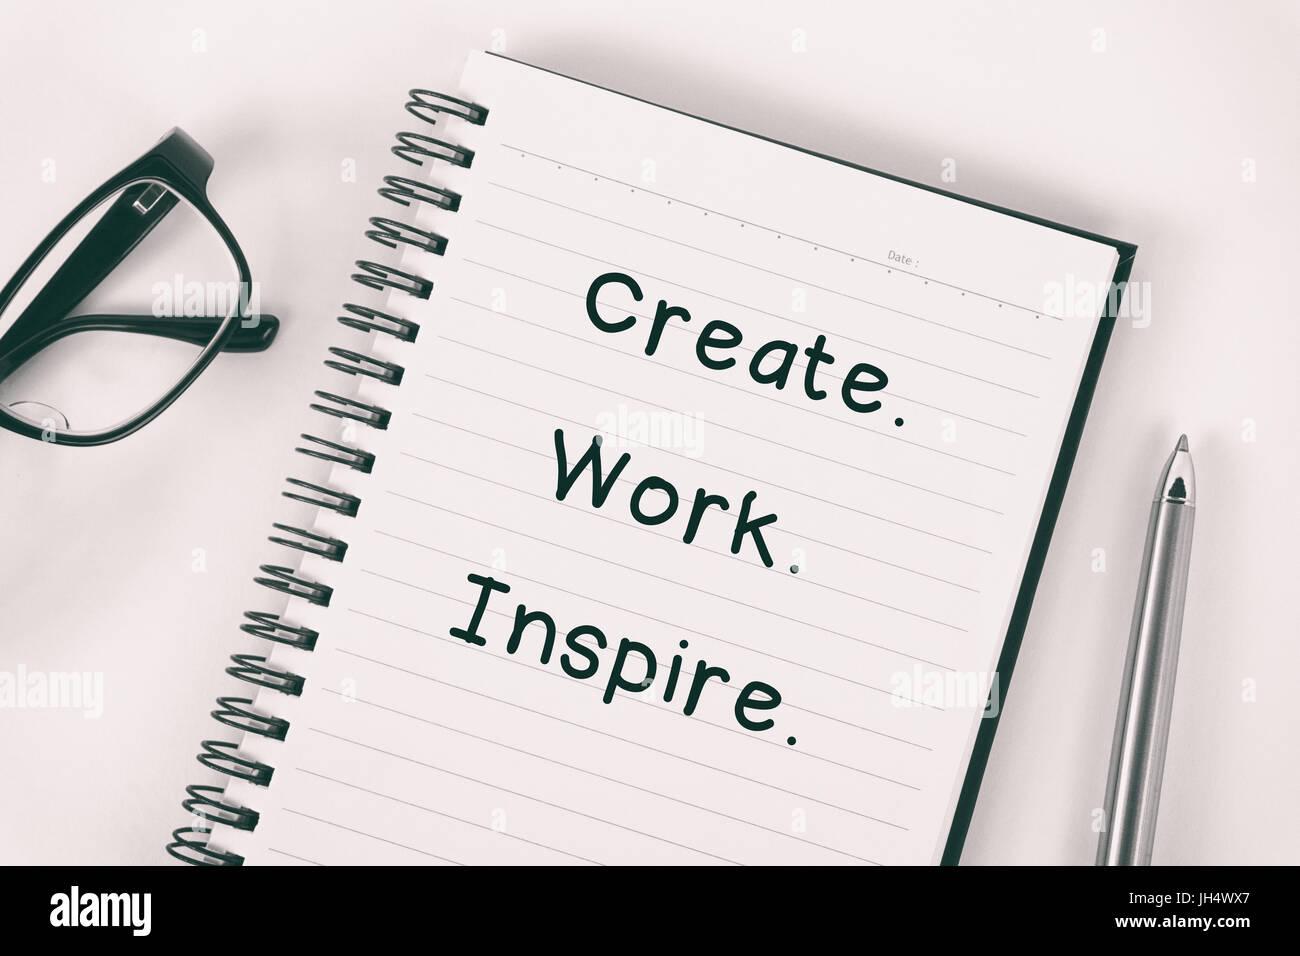 Citation Inspirante Créer Travailler Inspirer écrit